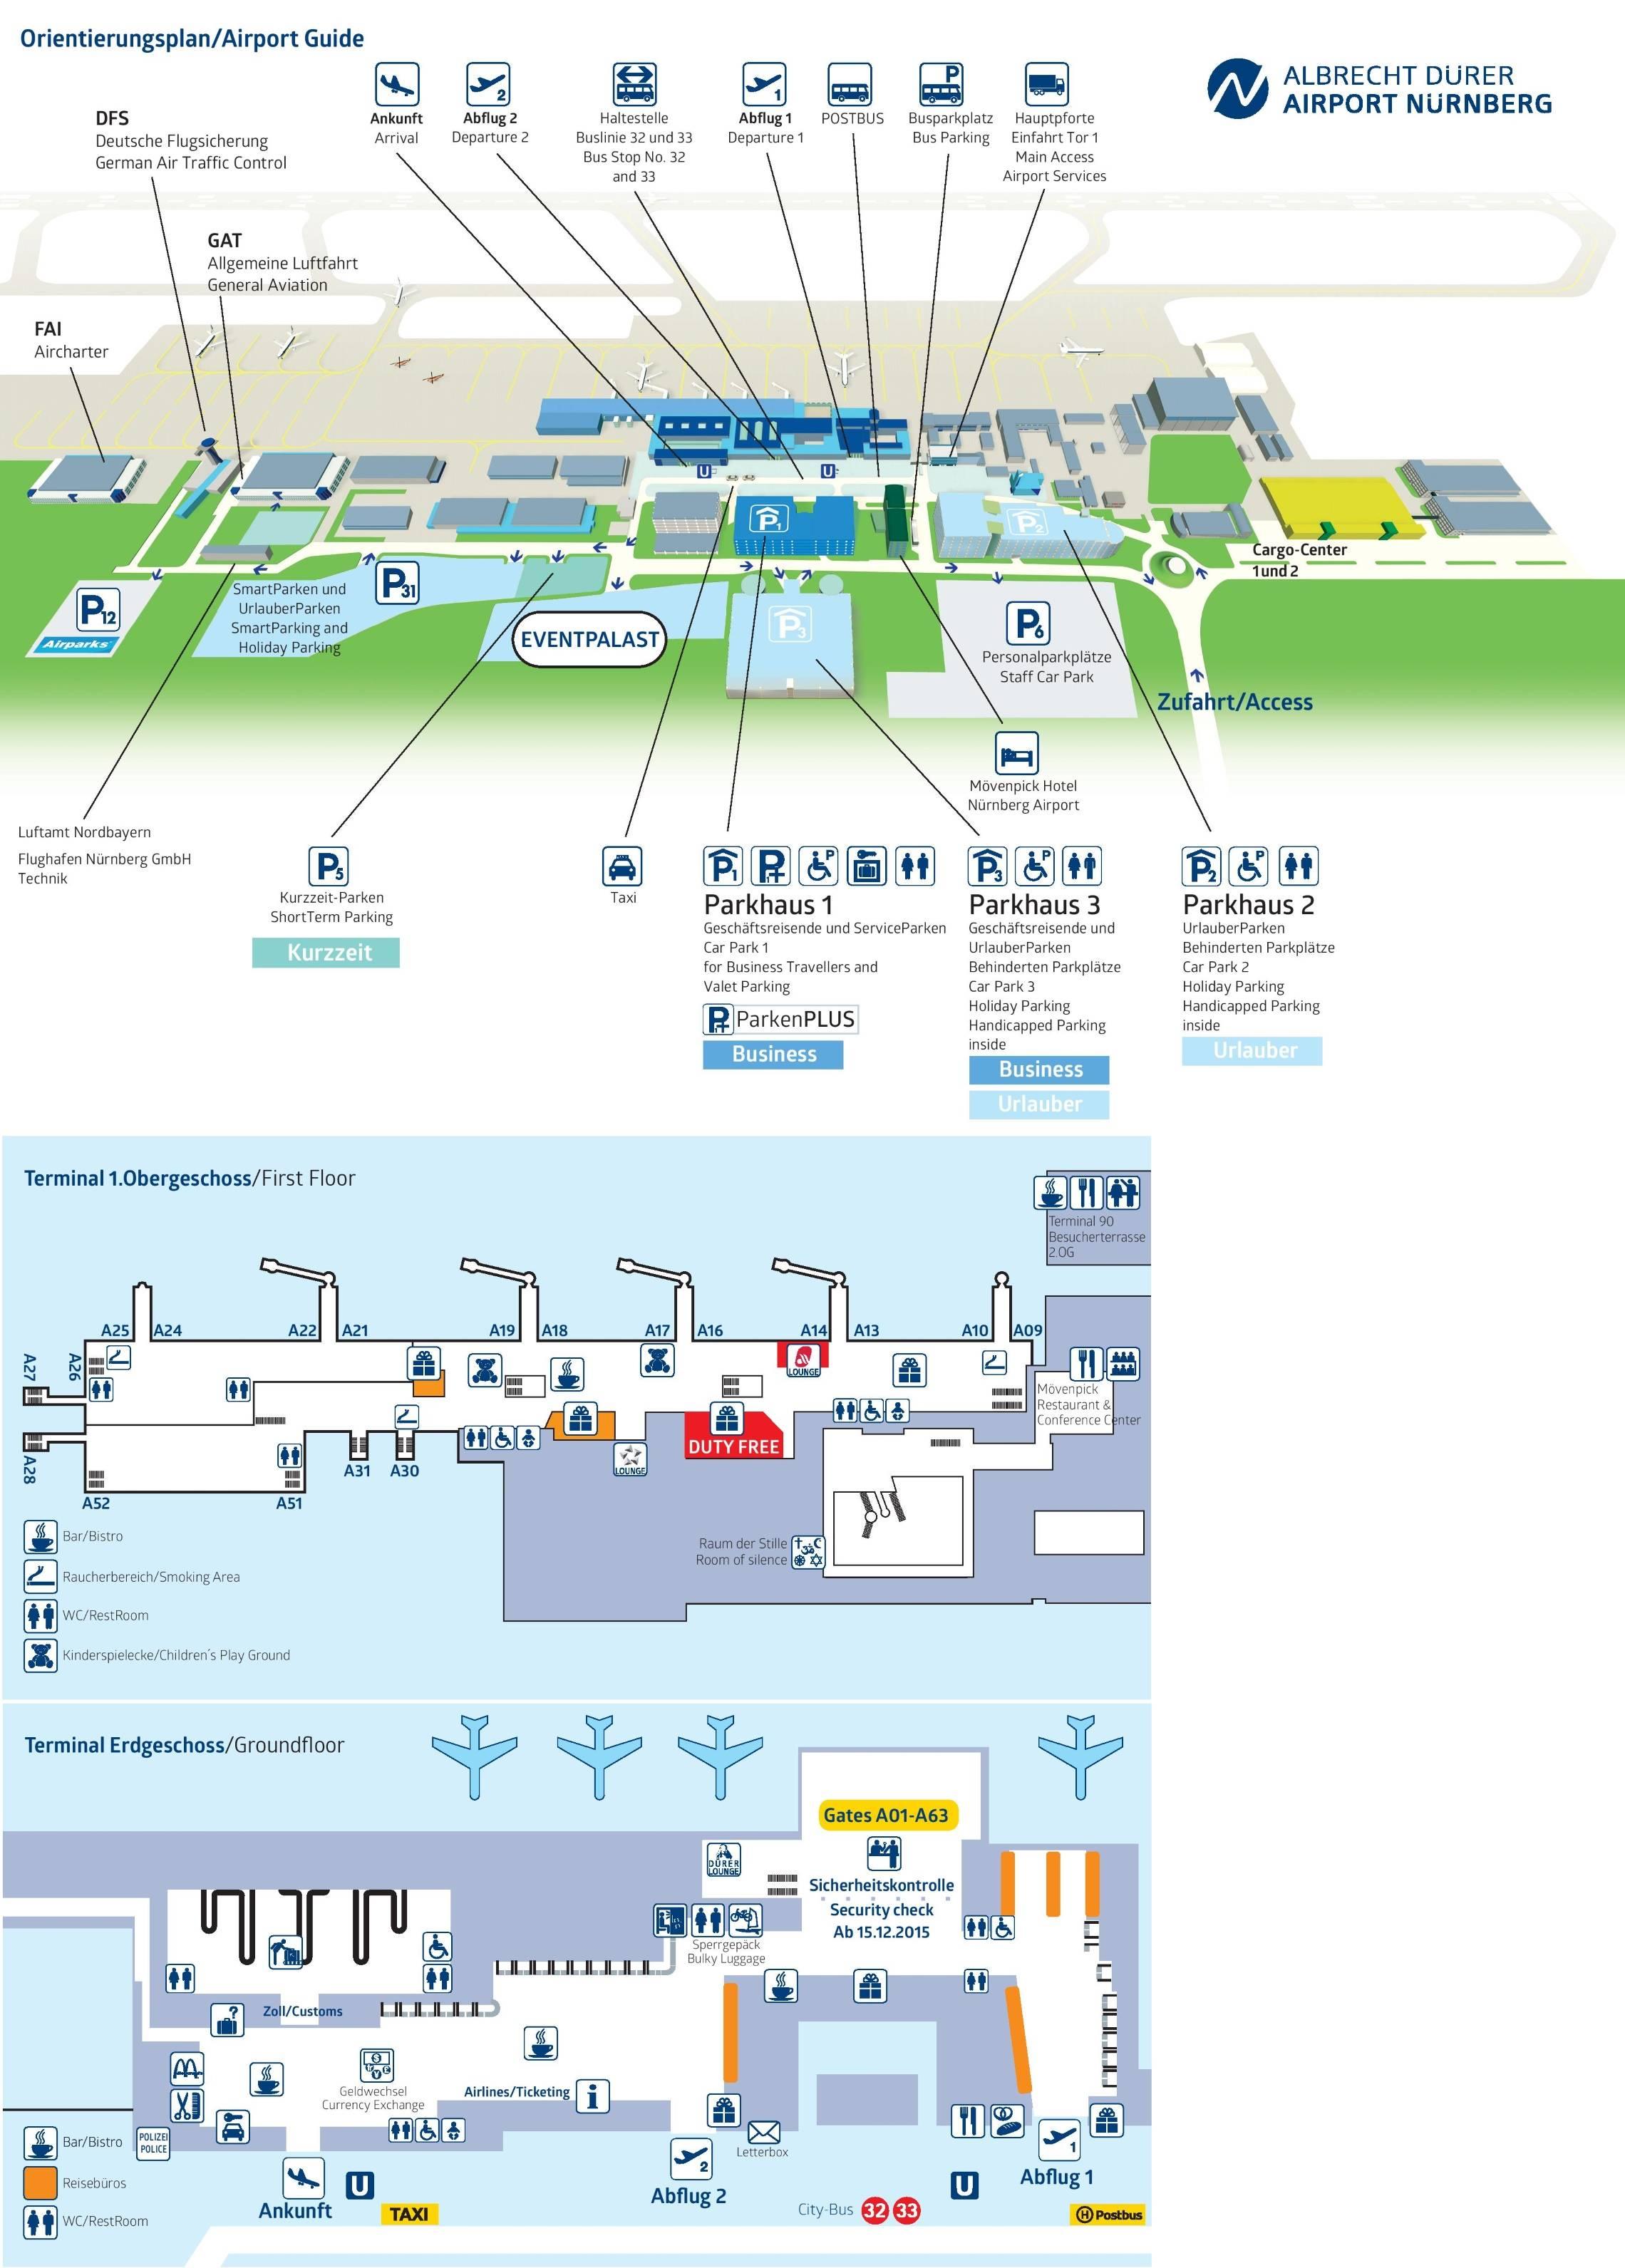 Аэропорт «шарль де голль» в париже